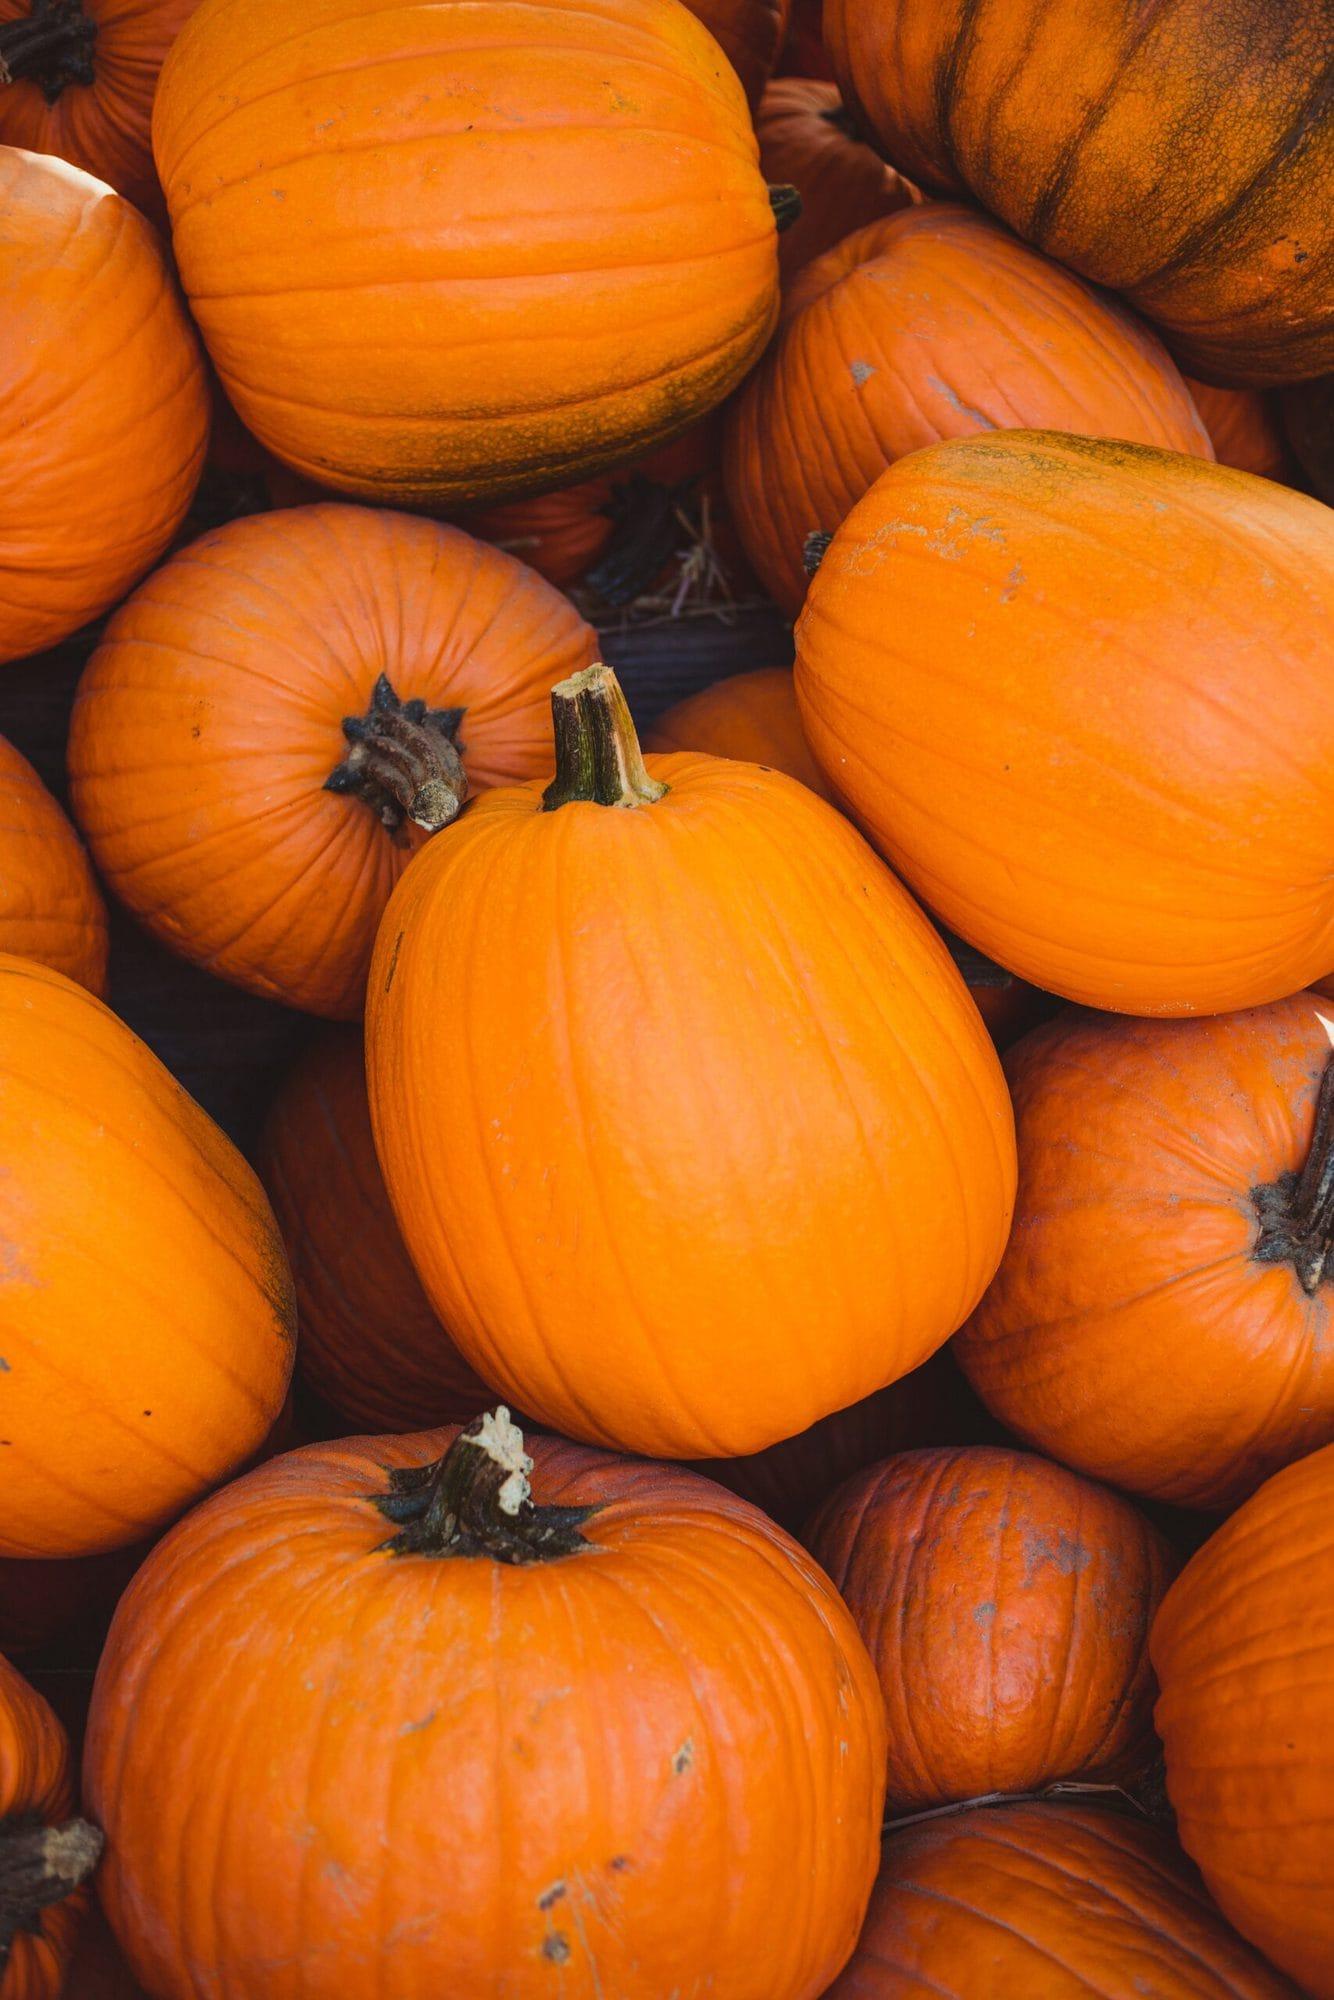 Pile of orange pumpkins waiting to be carved.